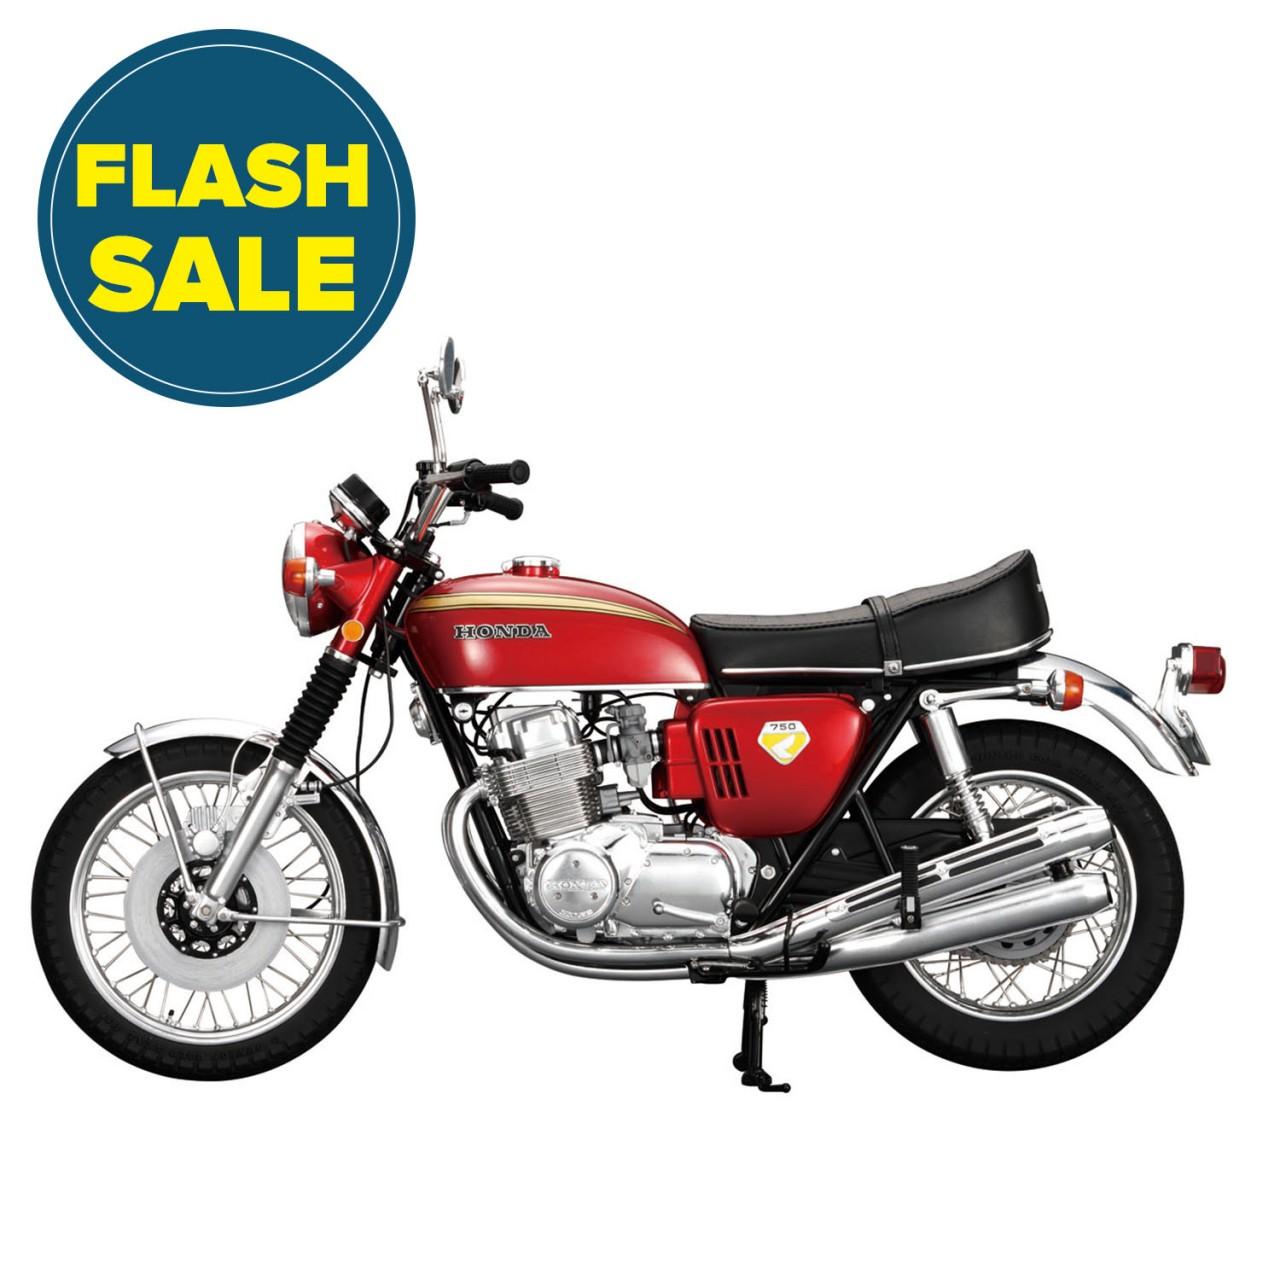 Honda Cb750 Motorcycle Model 14 Scale Full Kit Modelspace